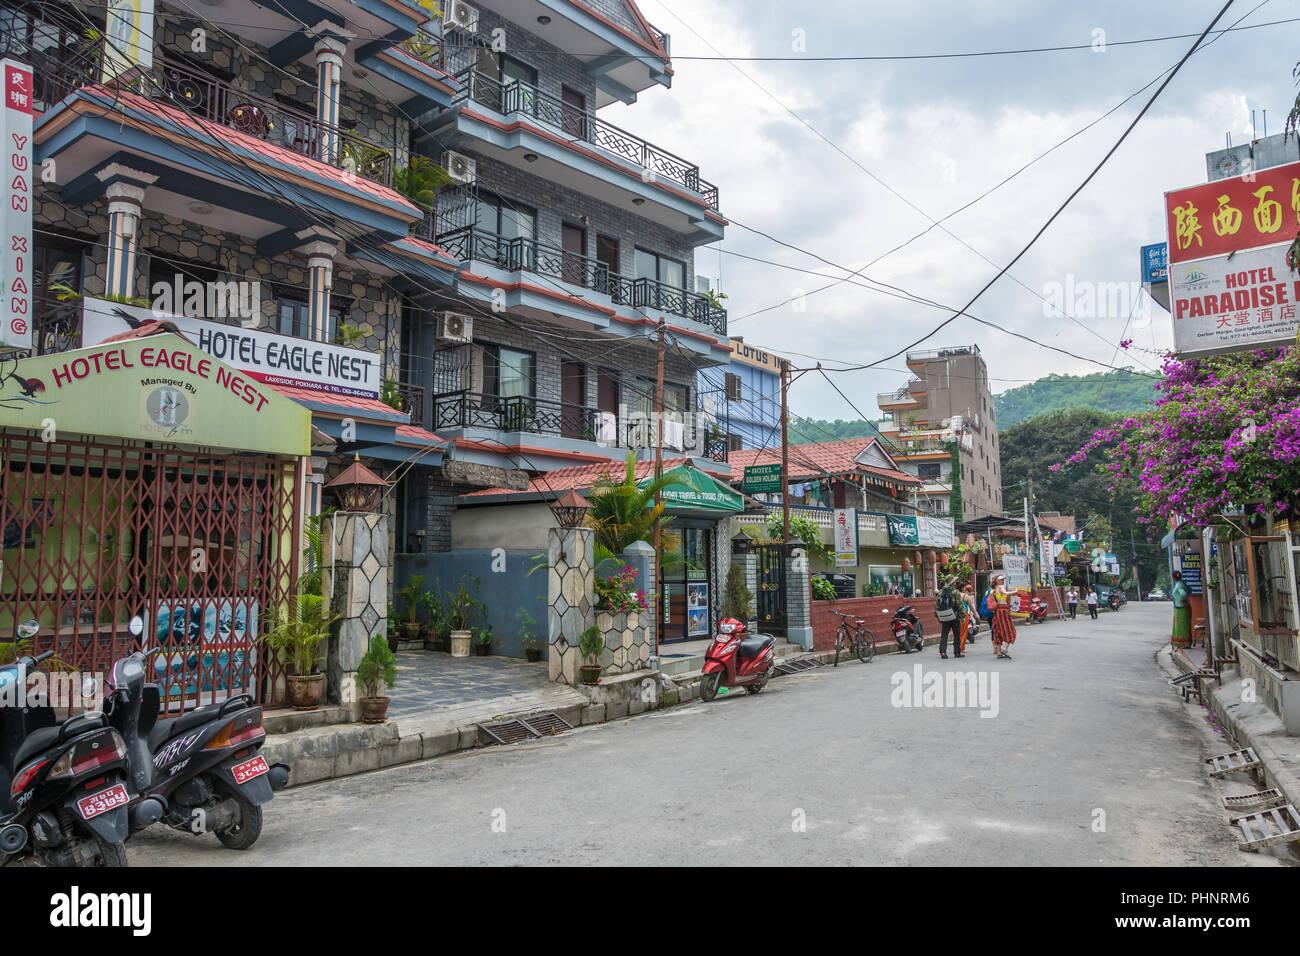 Pokhara, Nepal -11.04.2018: Pokhara Straße an einem bewölkten Tag am 11. April 2018 in Pokhara, Nepal. Stockbild